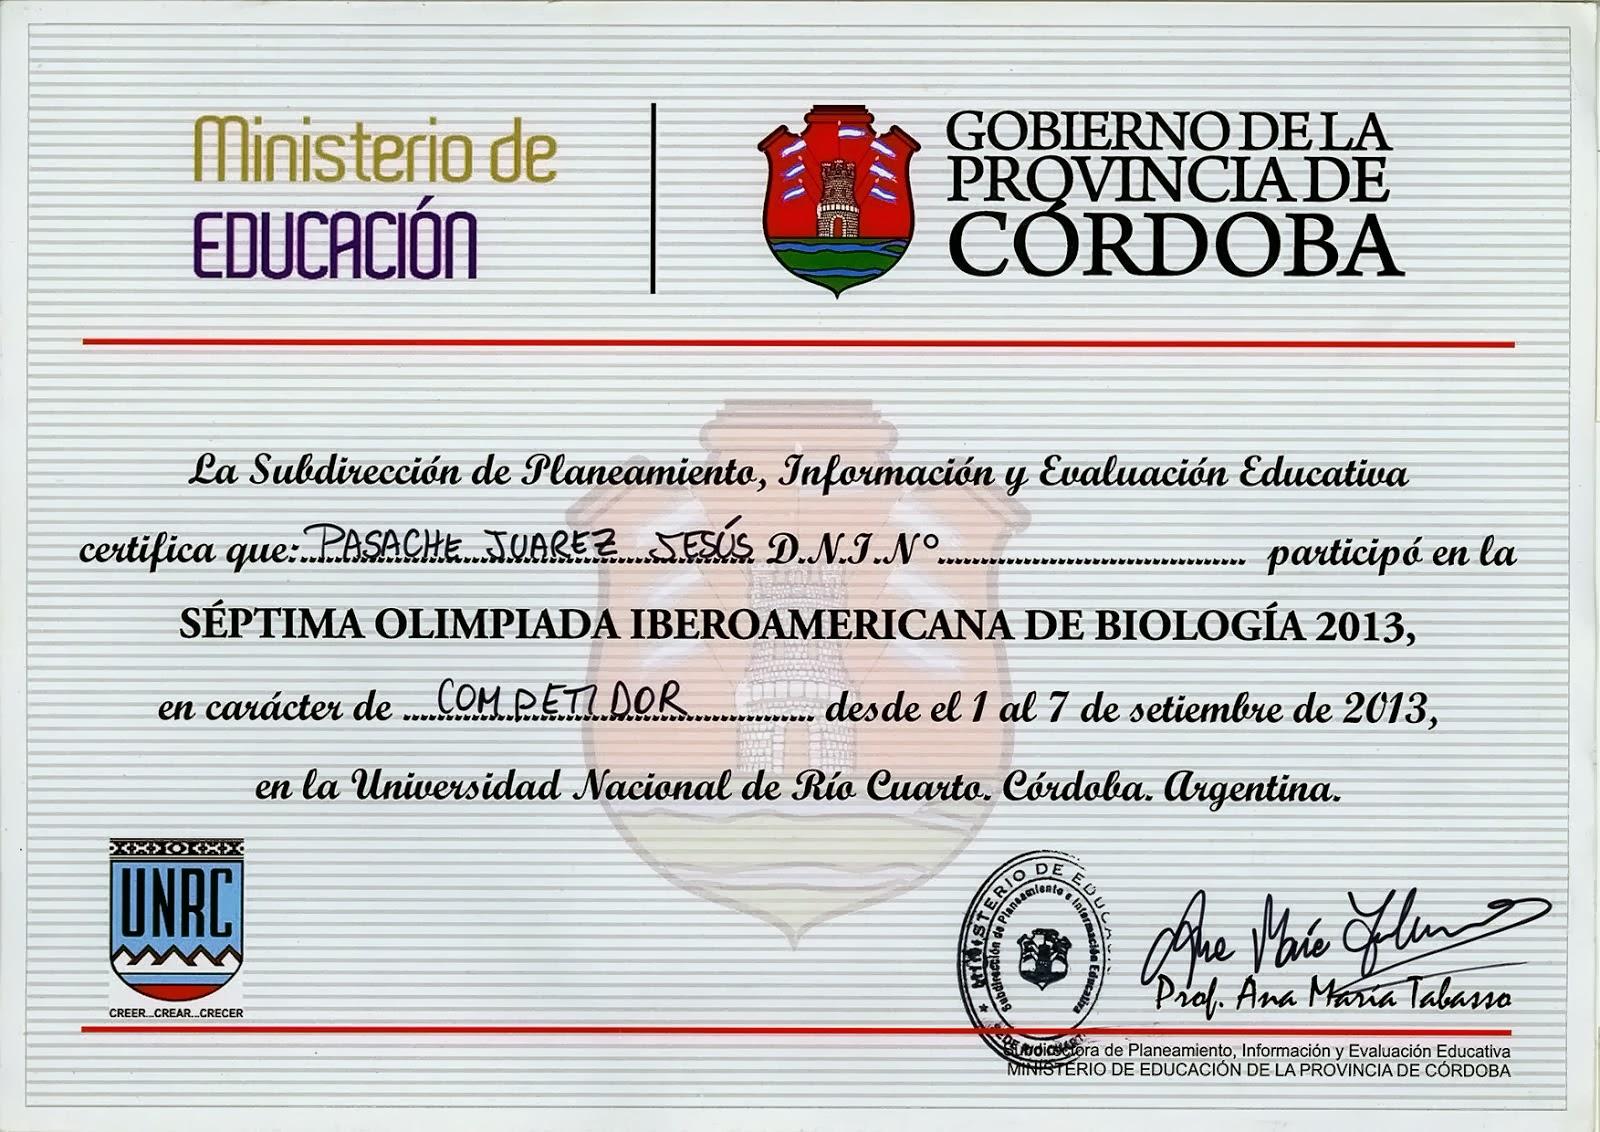 VII OLIMPIADA IBEROAMERICANA DE BIOLOGIA O.I.A.B. RIO CUARTO ARGENTINA 2013 : LA UNRC SERA SEDE EN